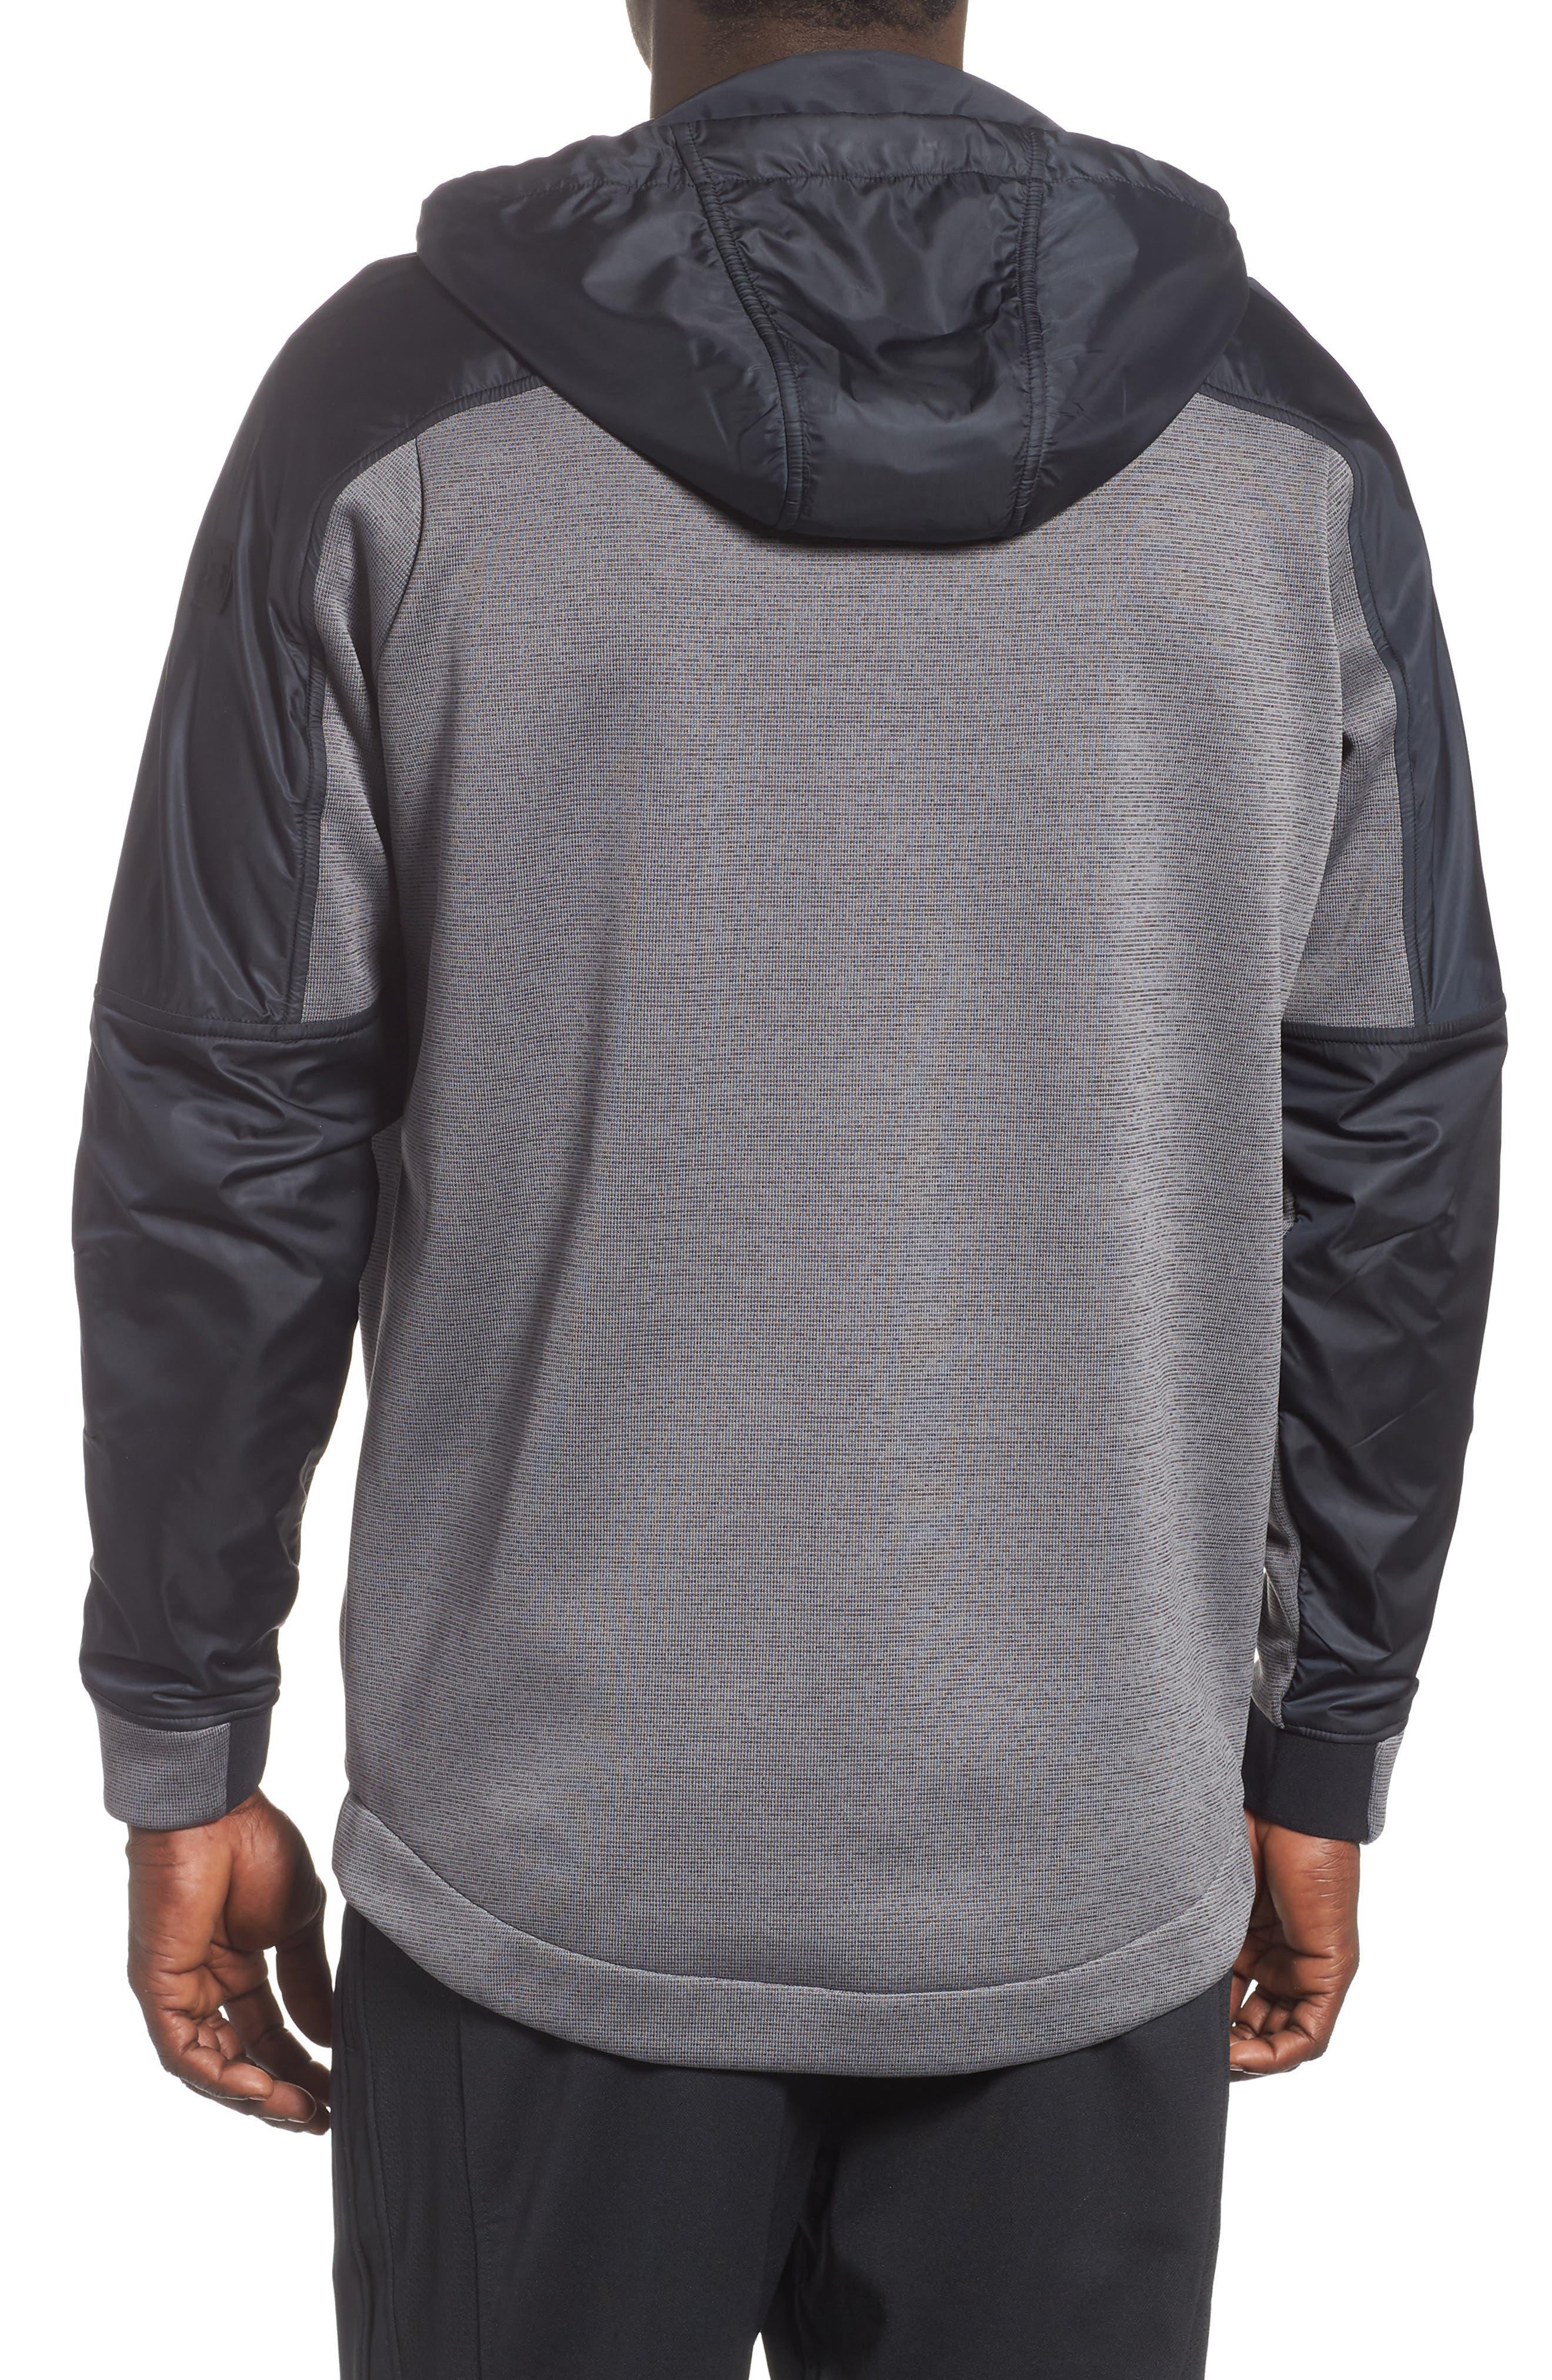 Unstoppable ColdGear<sup>®</sup> Jacket,                             Alternate thumbnail 2, color,                             CHARCOAL/ BLACK